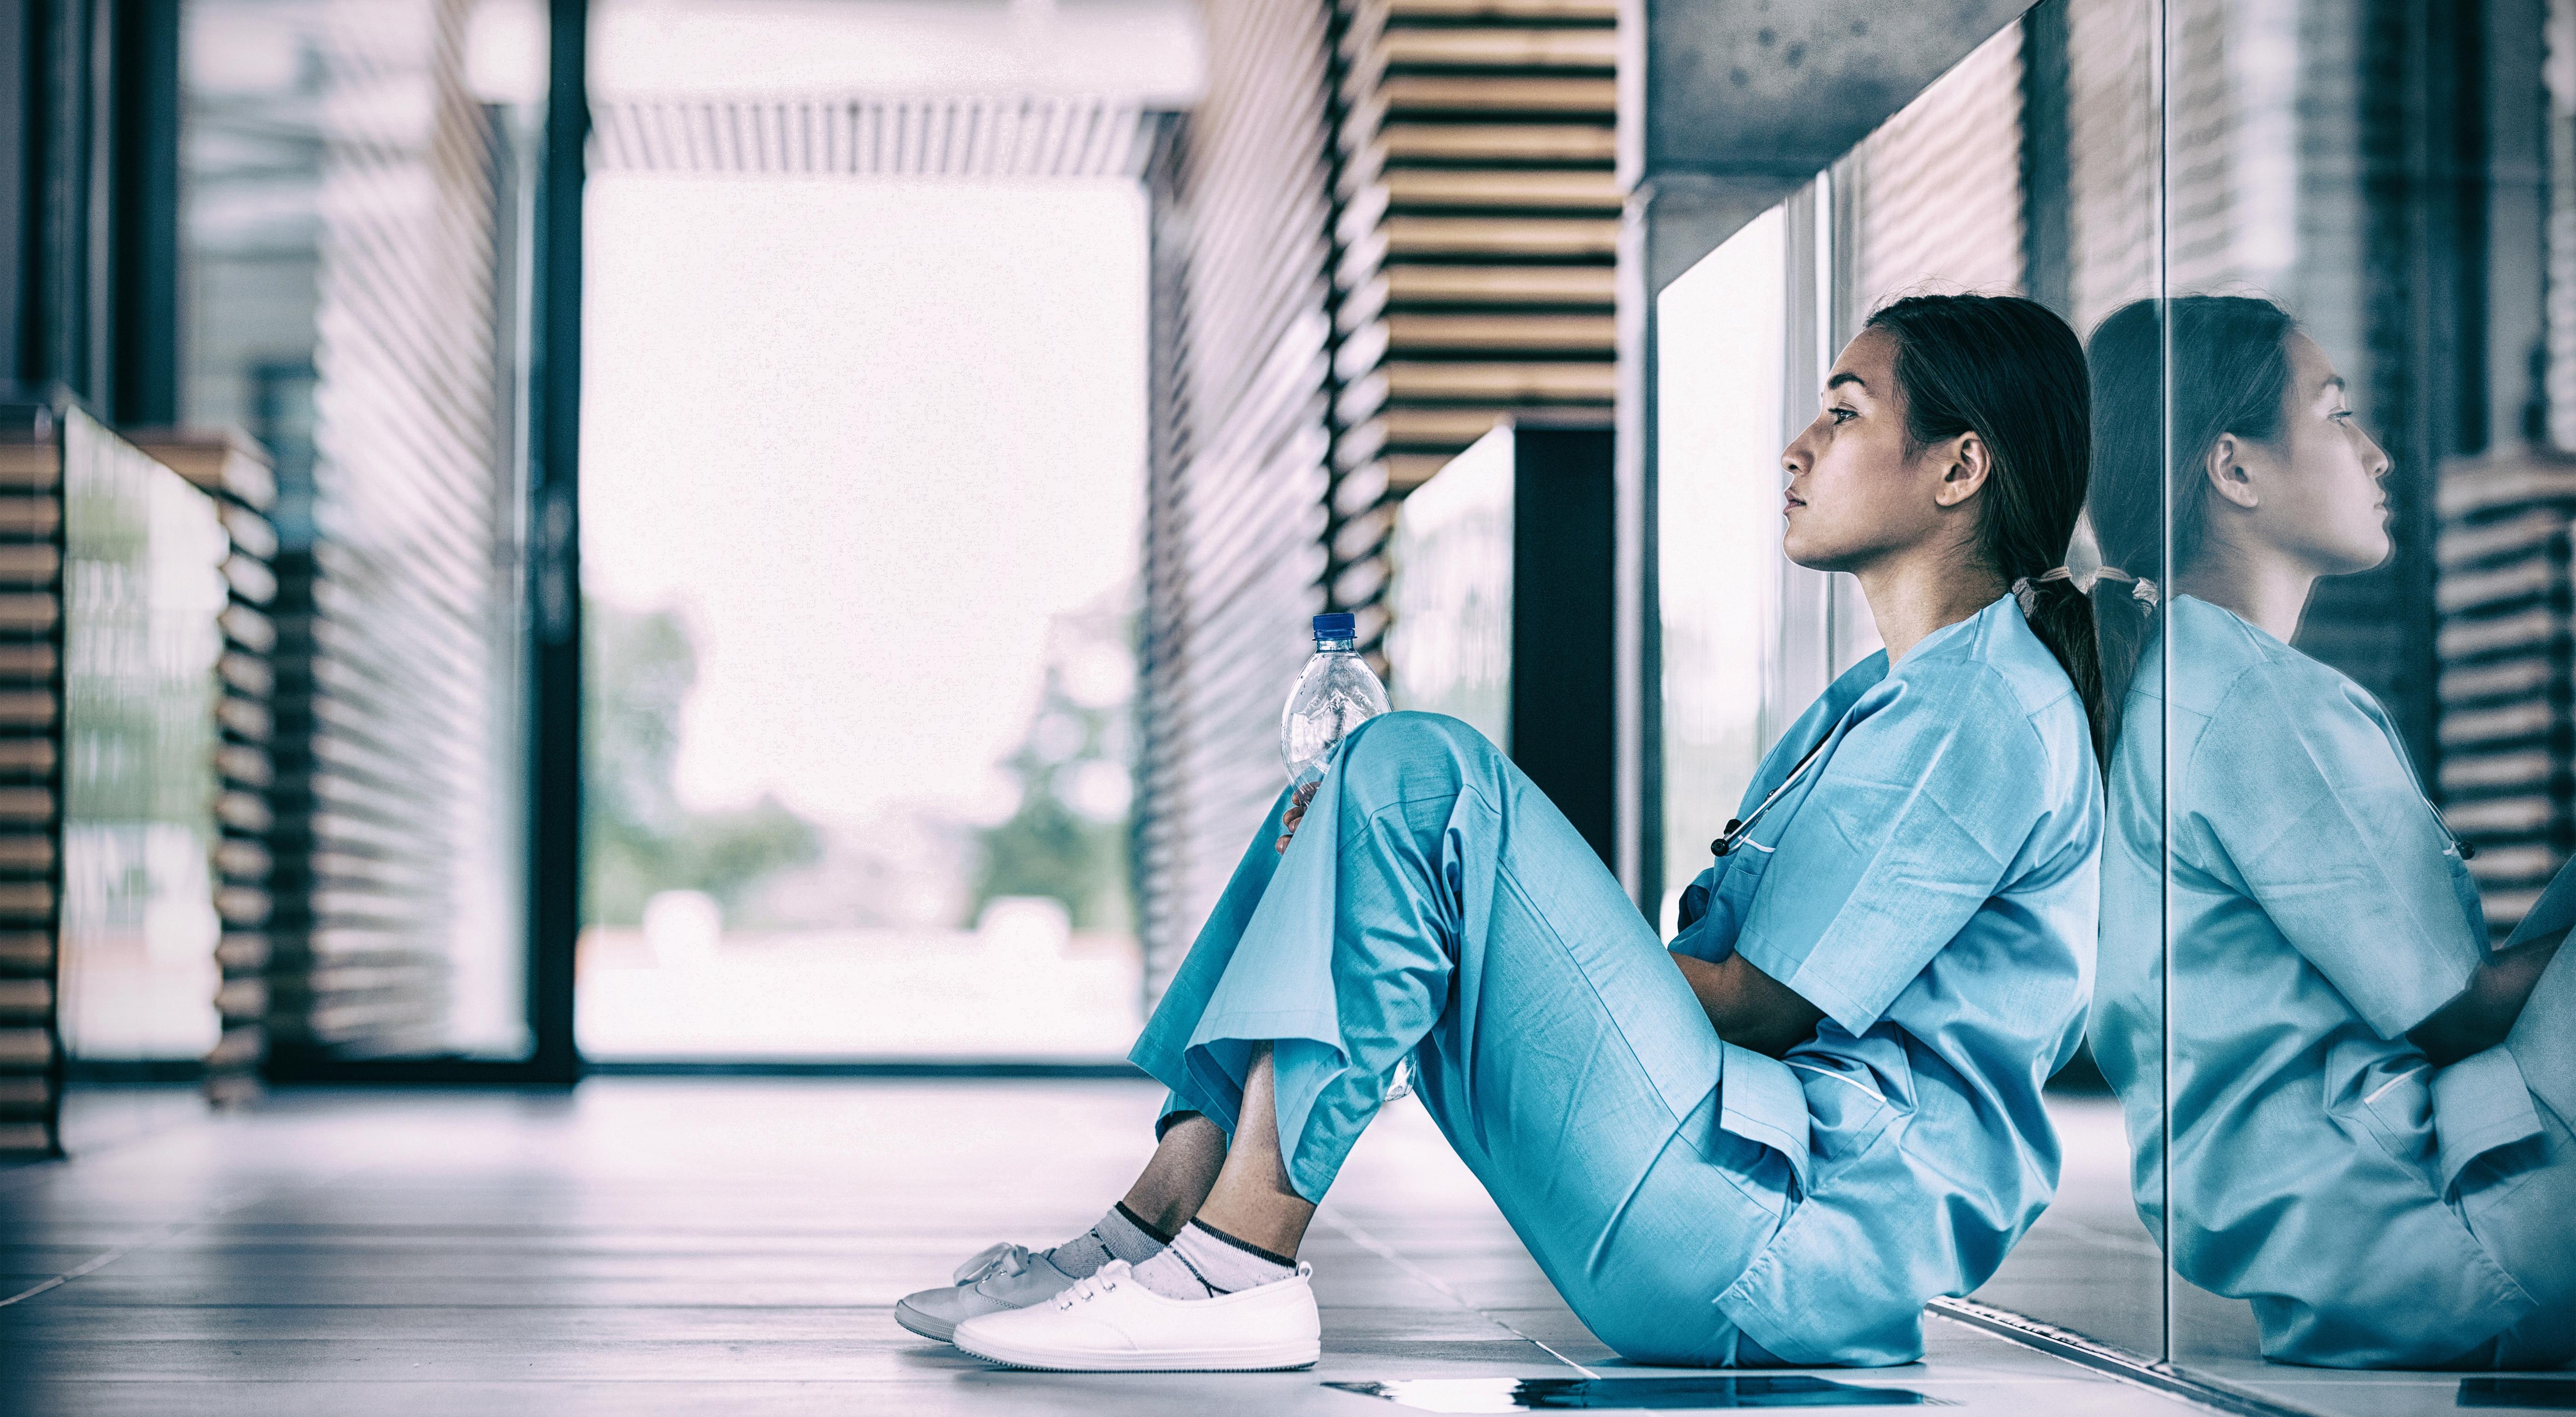 Facing Moral Distress as an Oncology Nurse